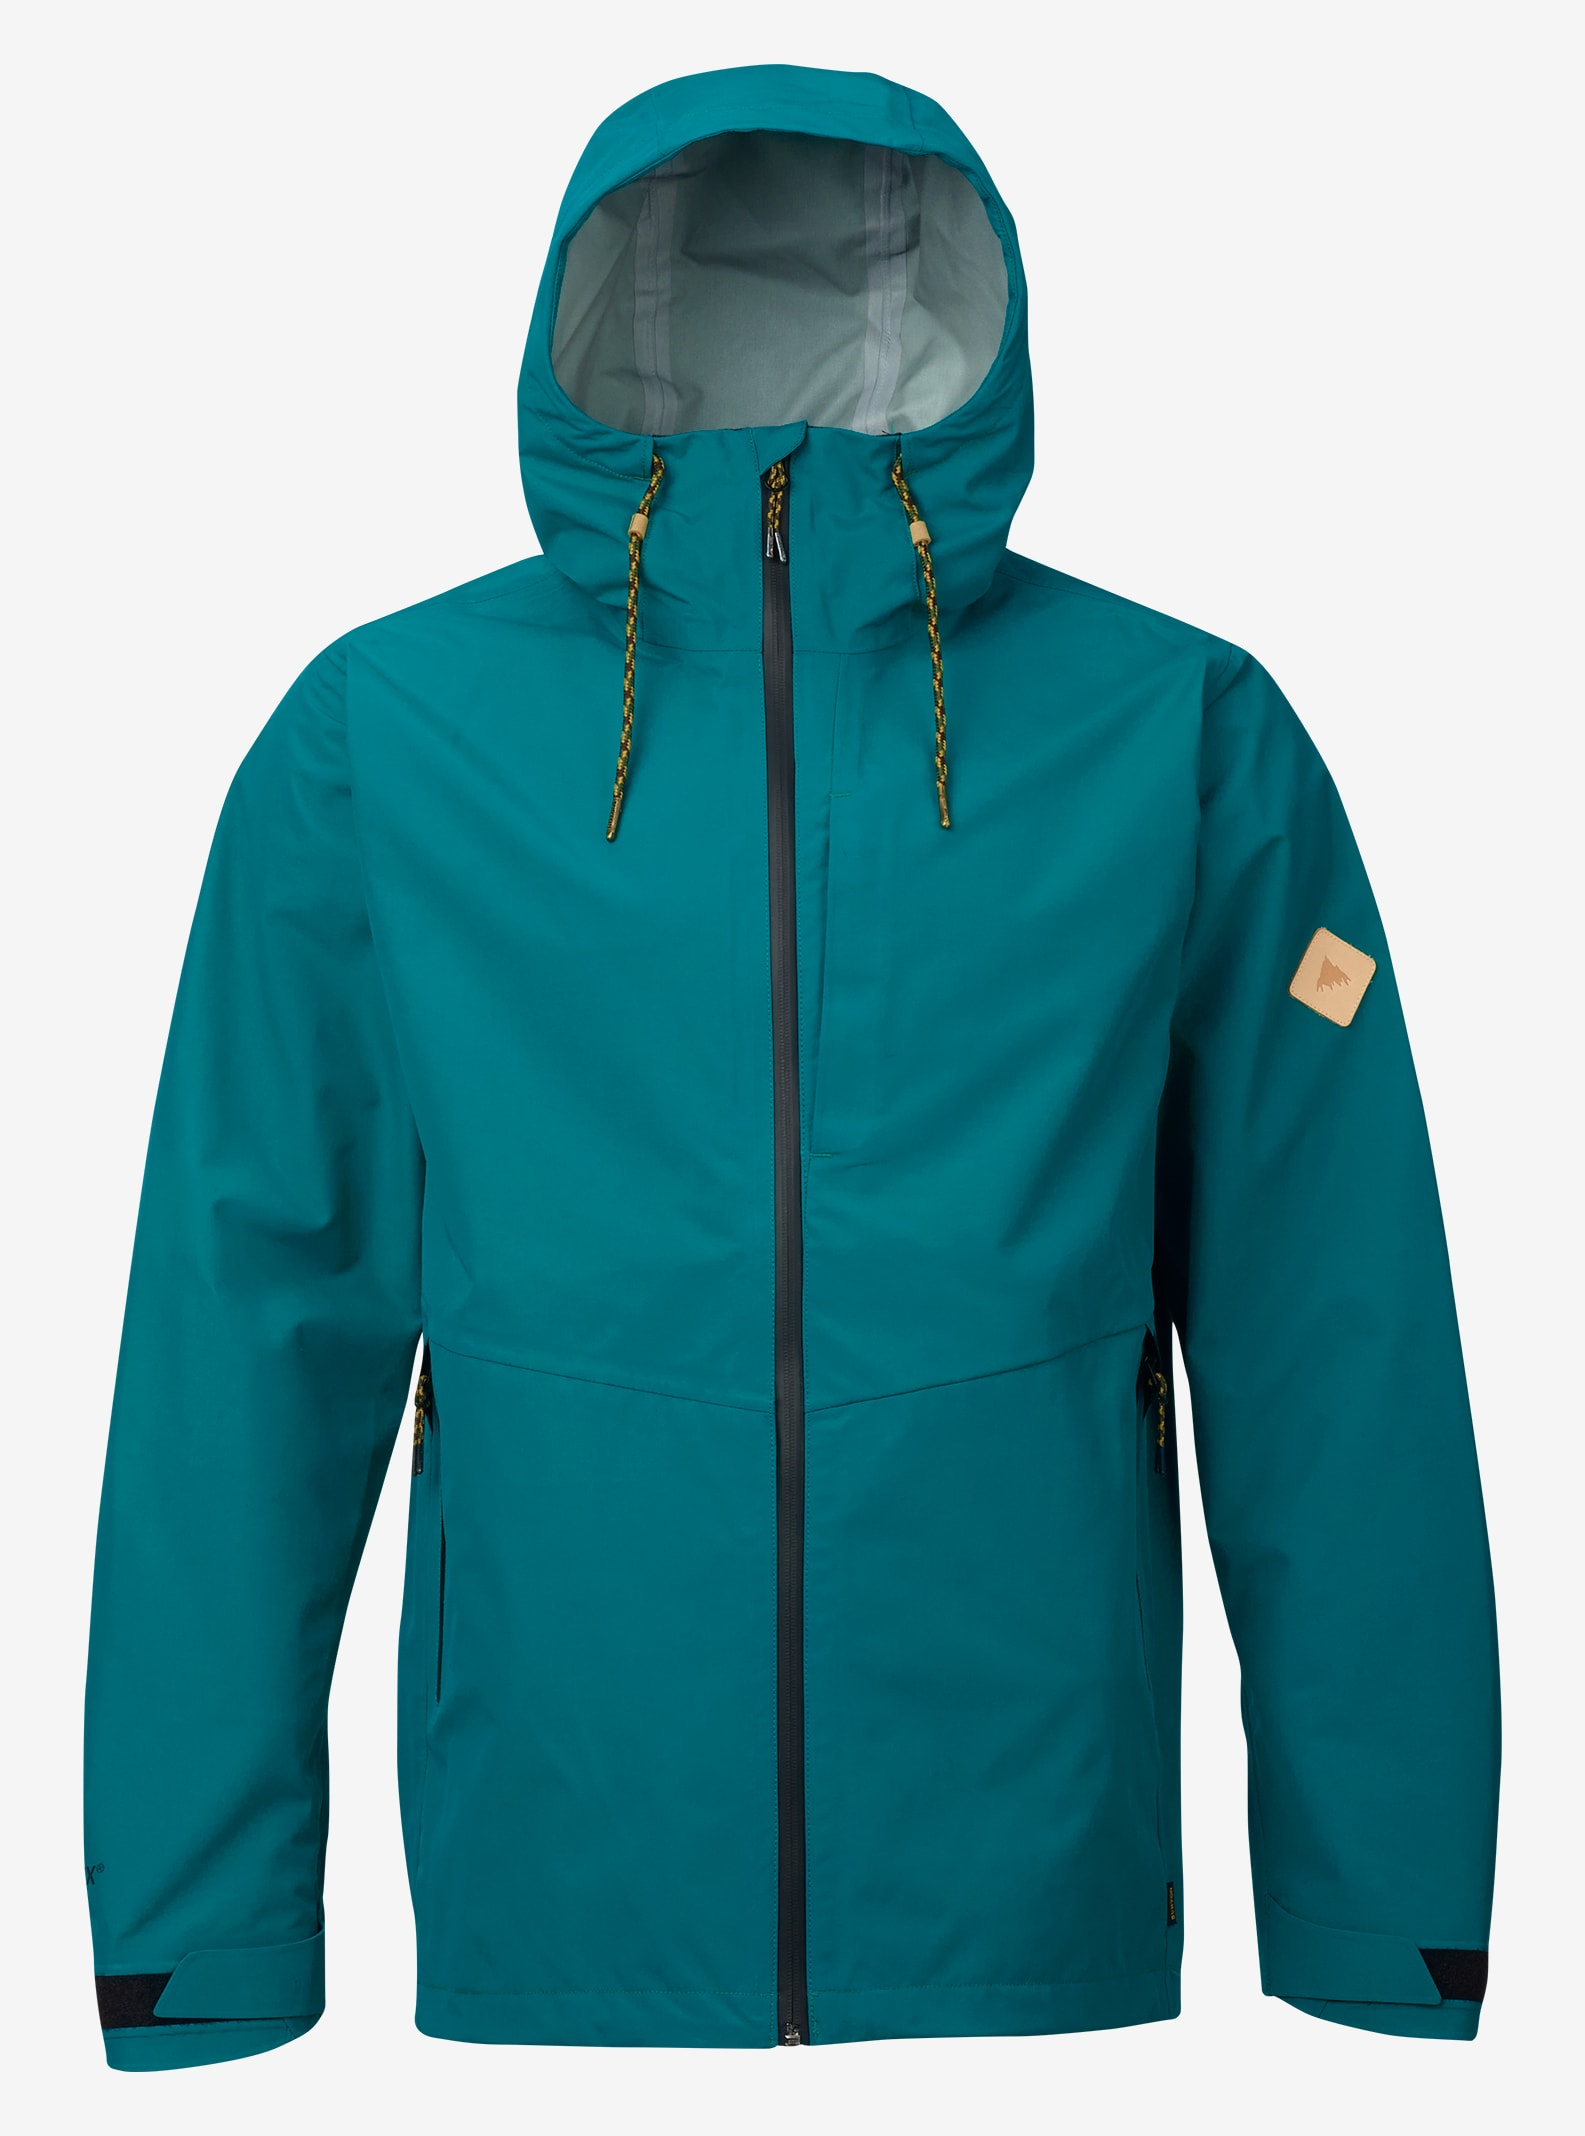 Burton GORE-TEX® 3L Sterling Rain Jacket shown in Fanfare